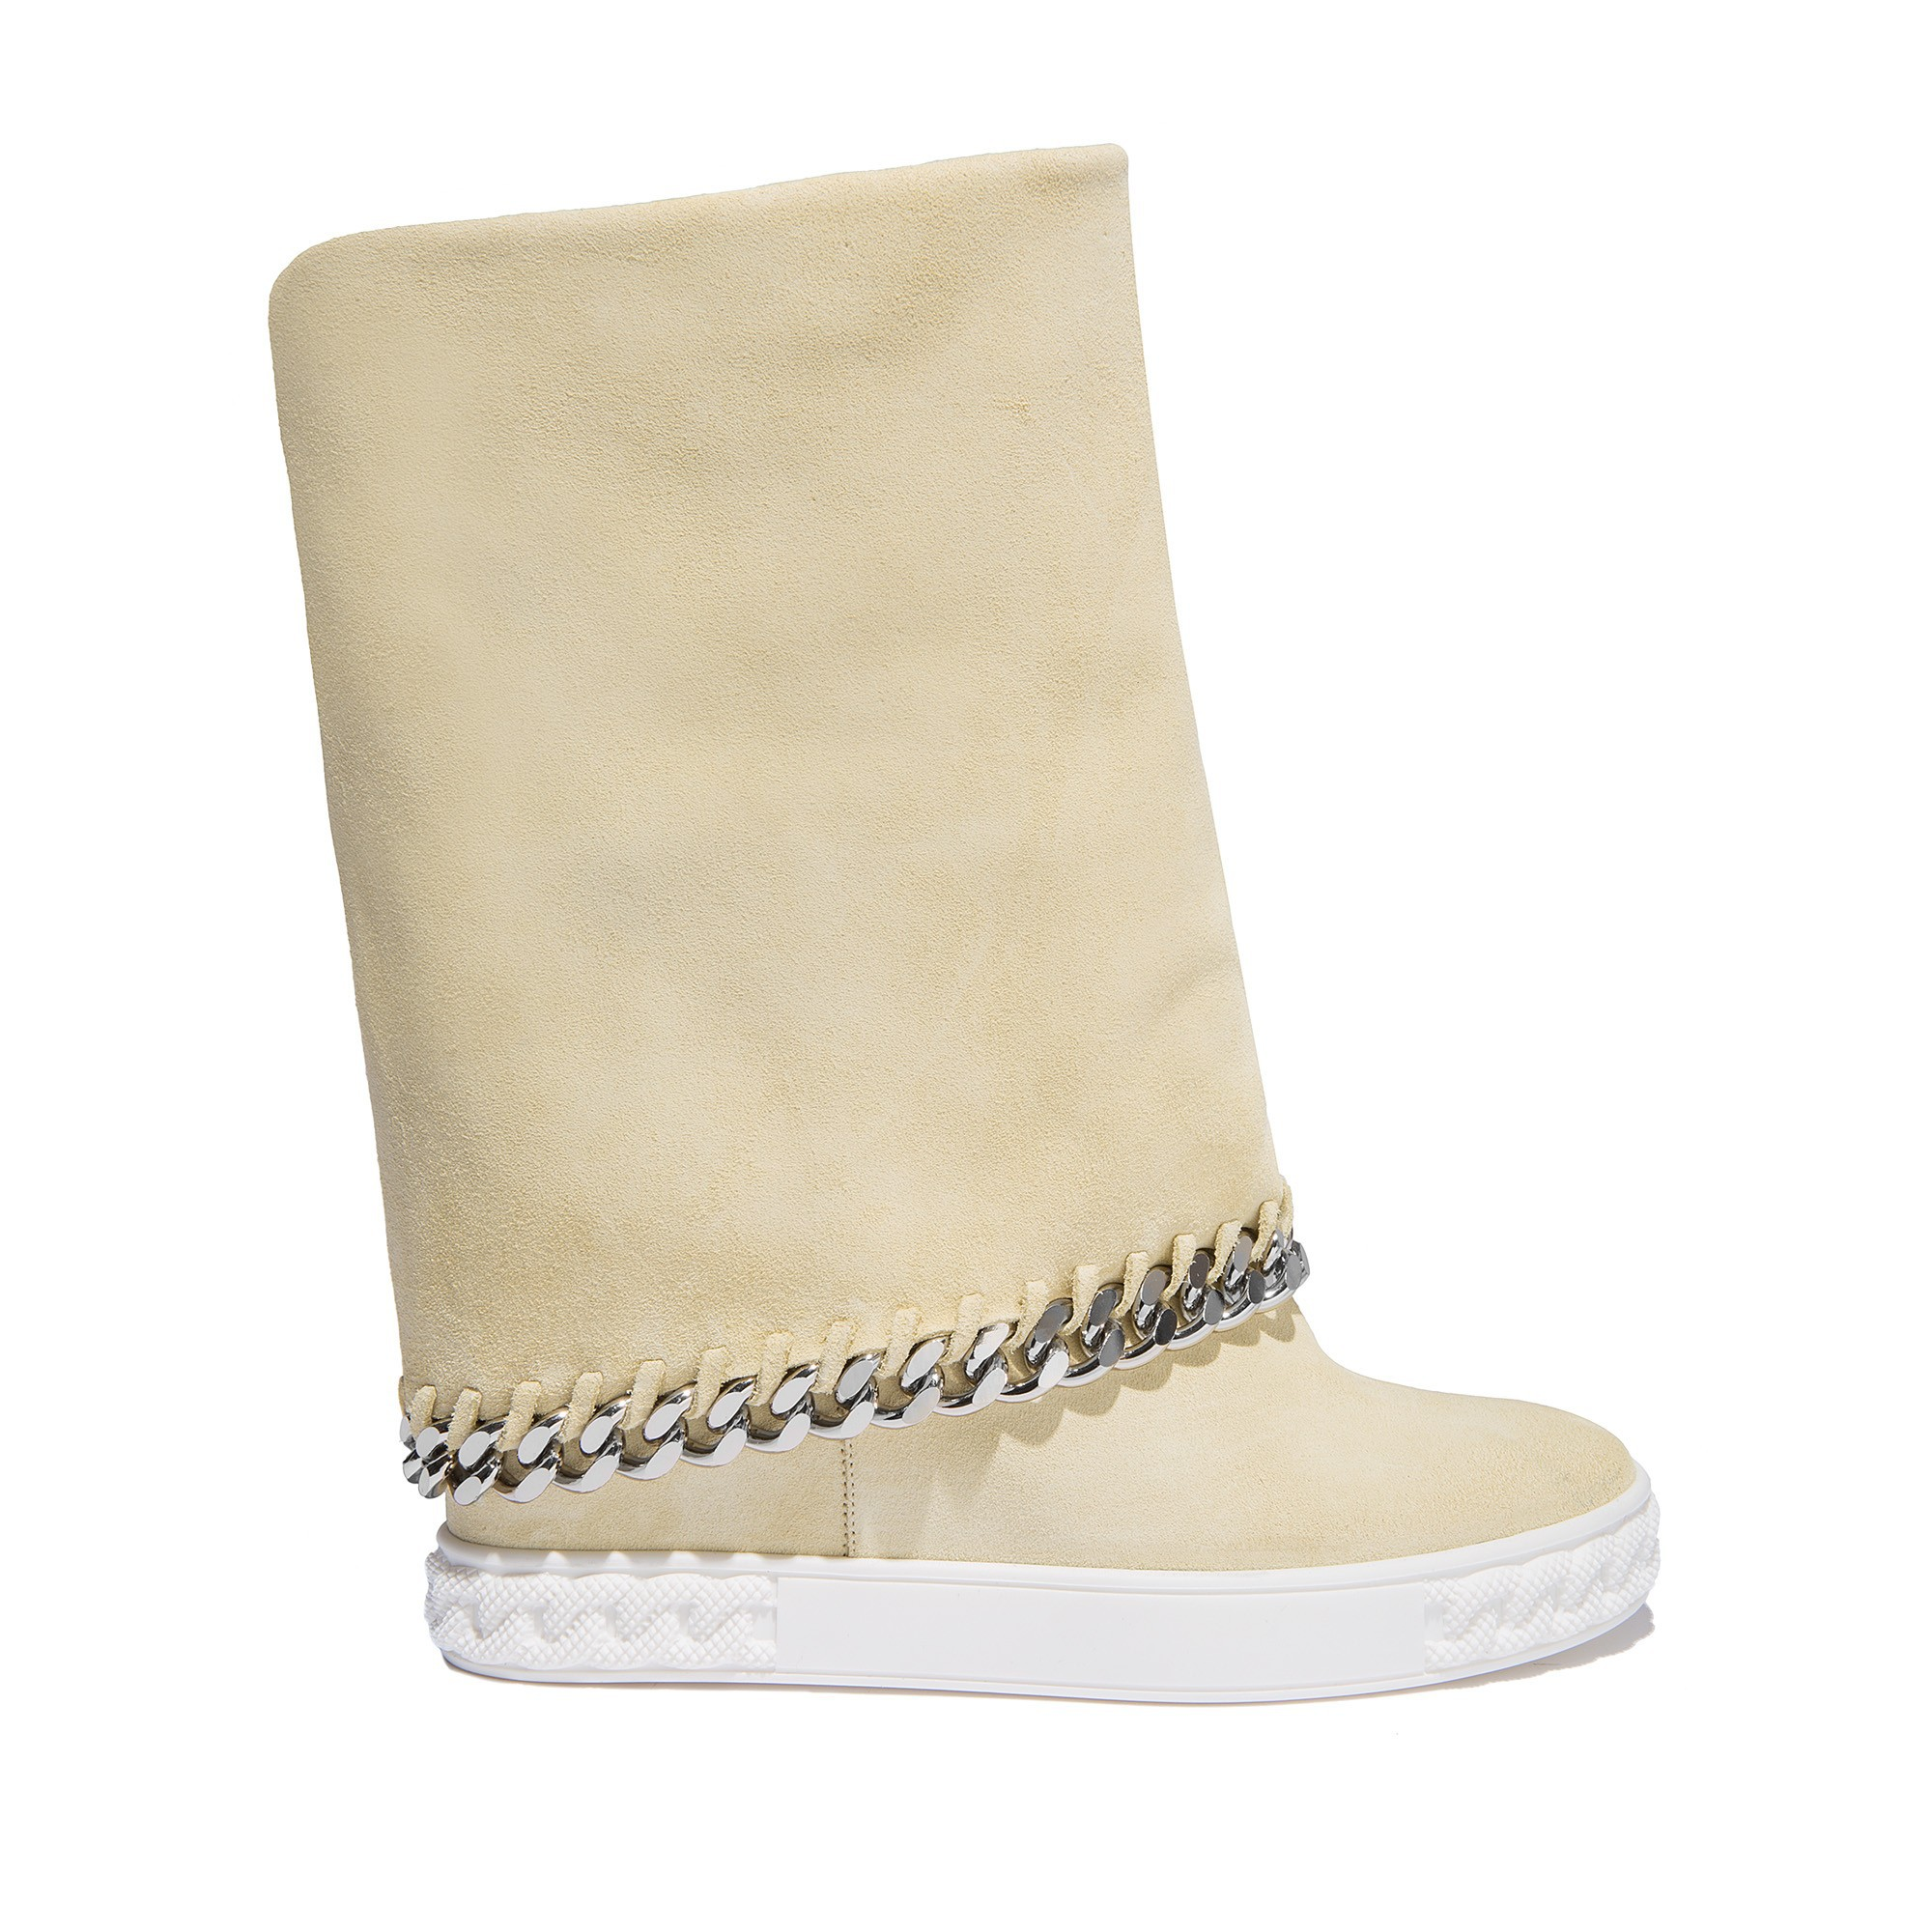 Casadei sneakers 2s060d080.c130w79